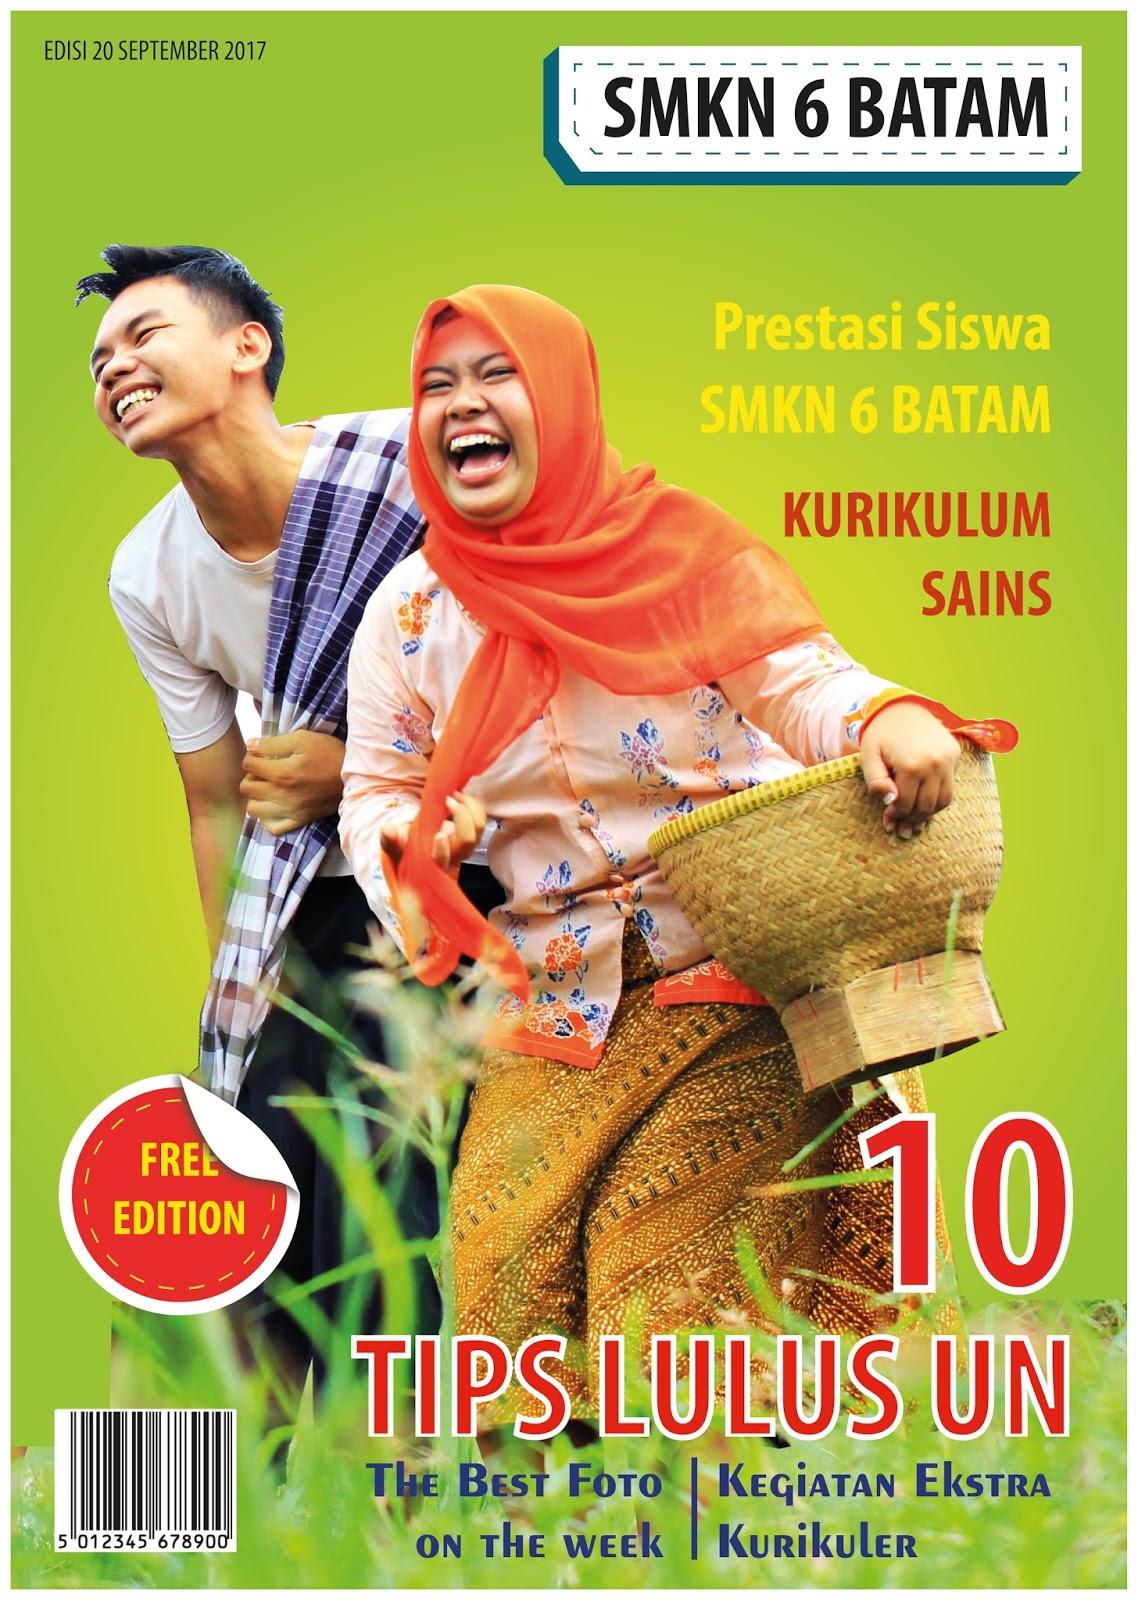 780 Foto Desain Grafis Majalah Paling Keren Download Gratis